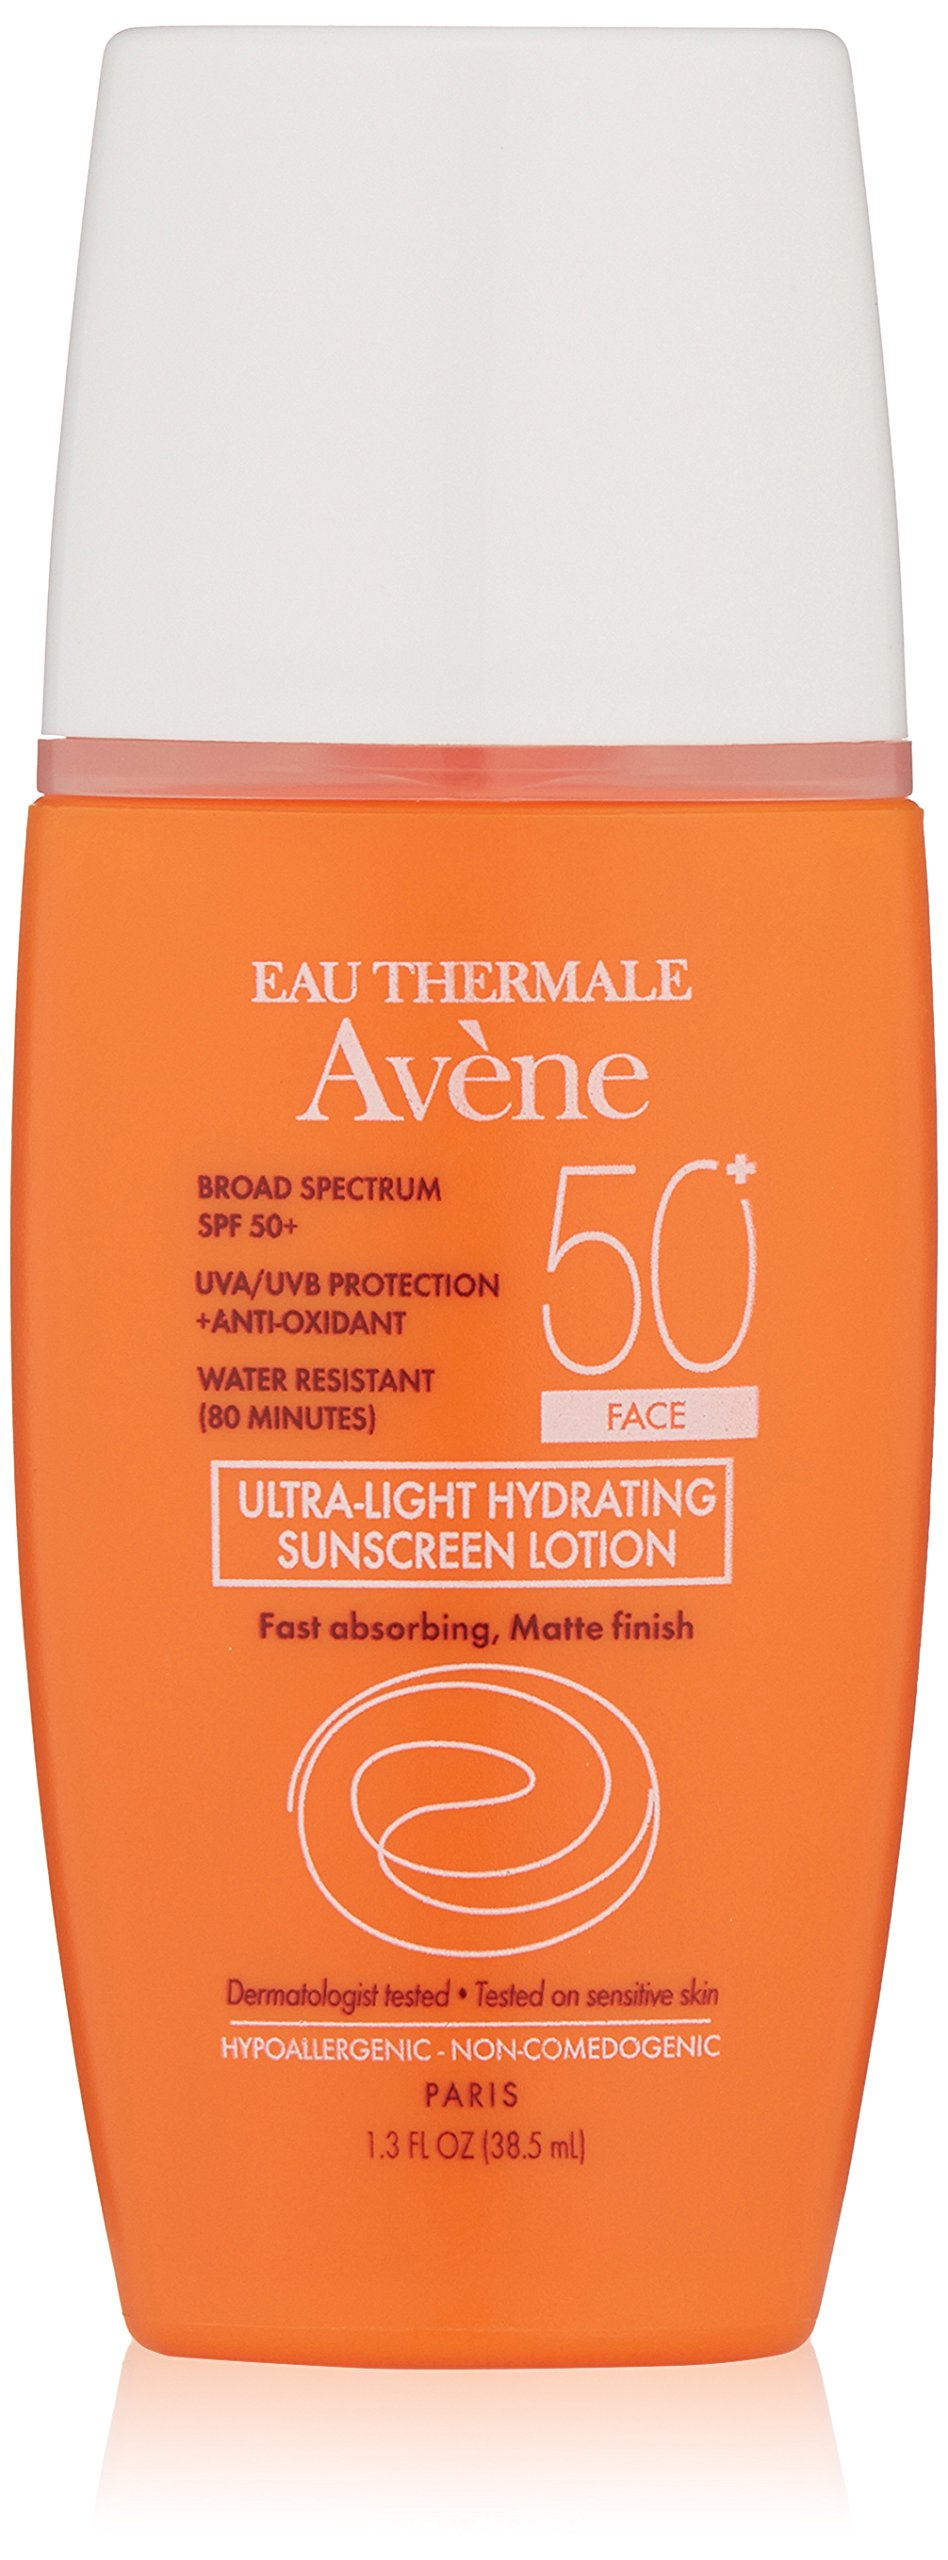 Eau Thermale Avene Ultra-Light Hydrating Sunscreen Lotion SPF 50+ (Face) 1.7 fl. oz